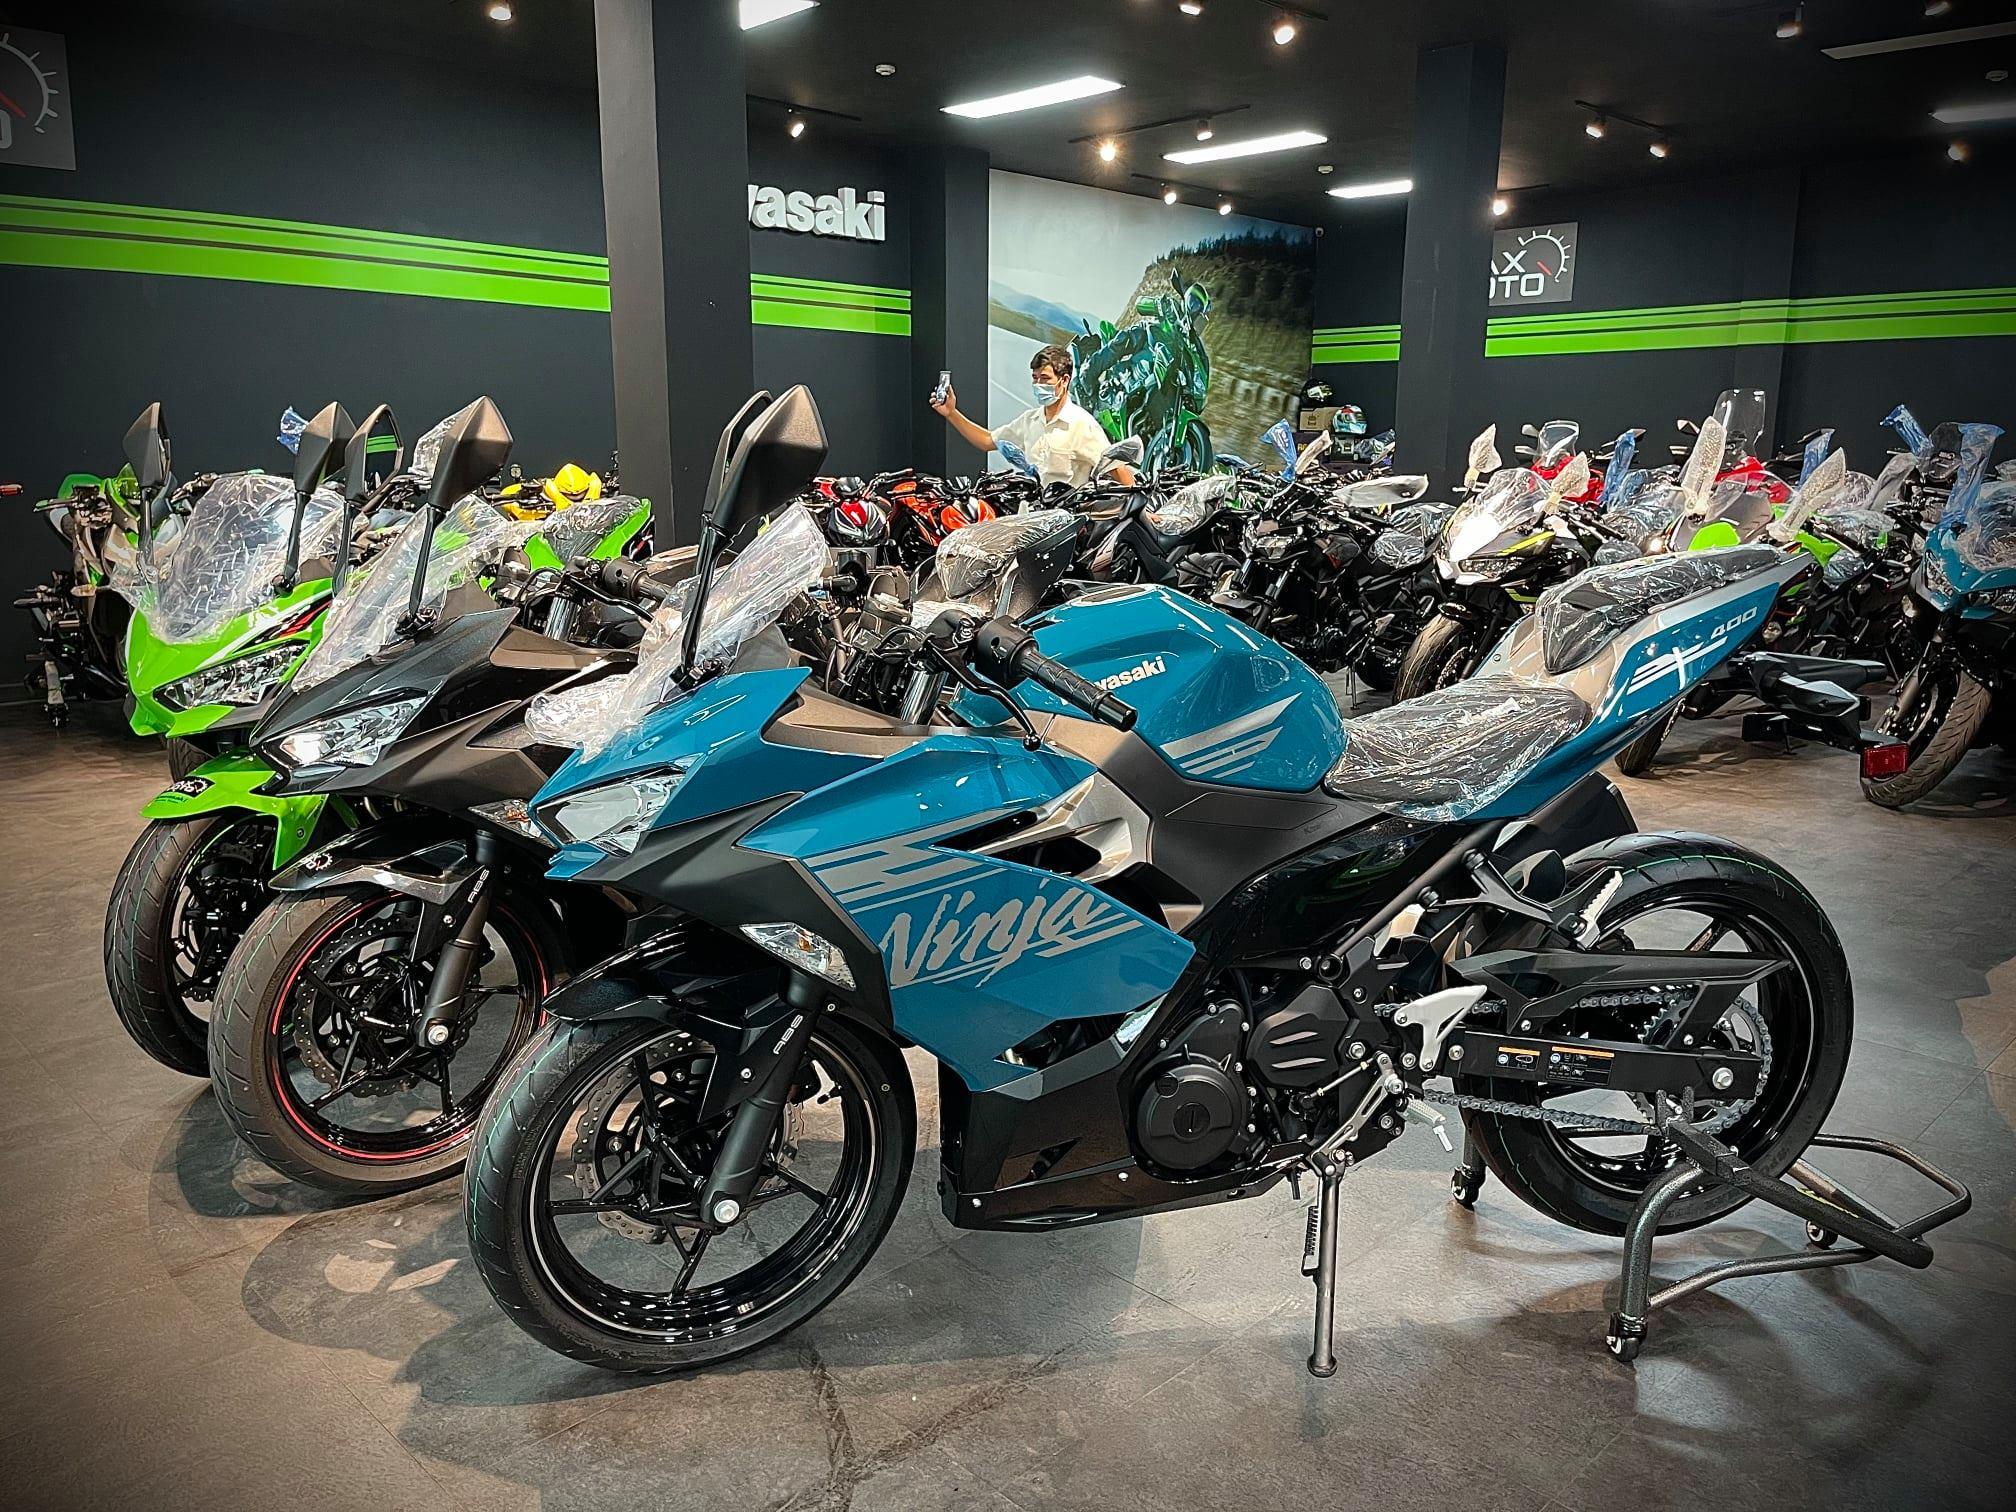 Kawasaki Ninja 400 2021 ấn tượng với diện mạo mới, giá từ 159 triệu đồng Kawawasaki Ninja 400 2021 (1).jpg